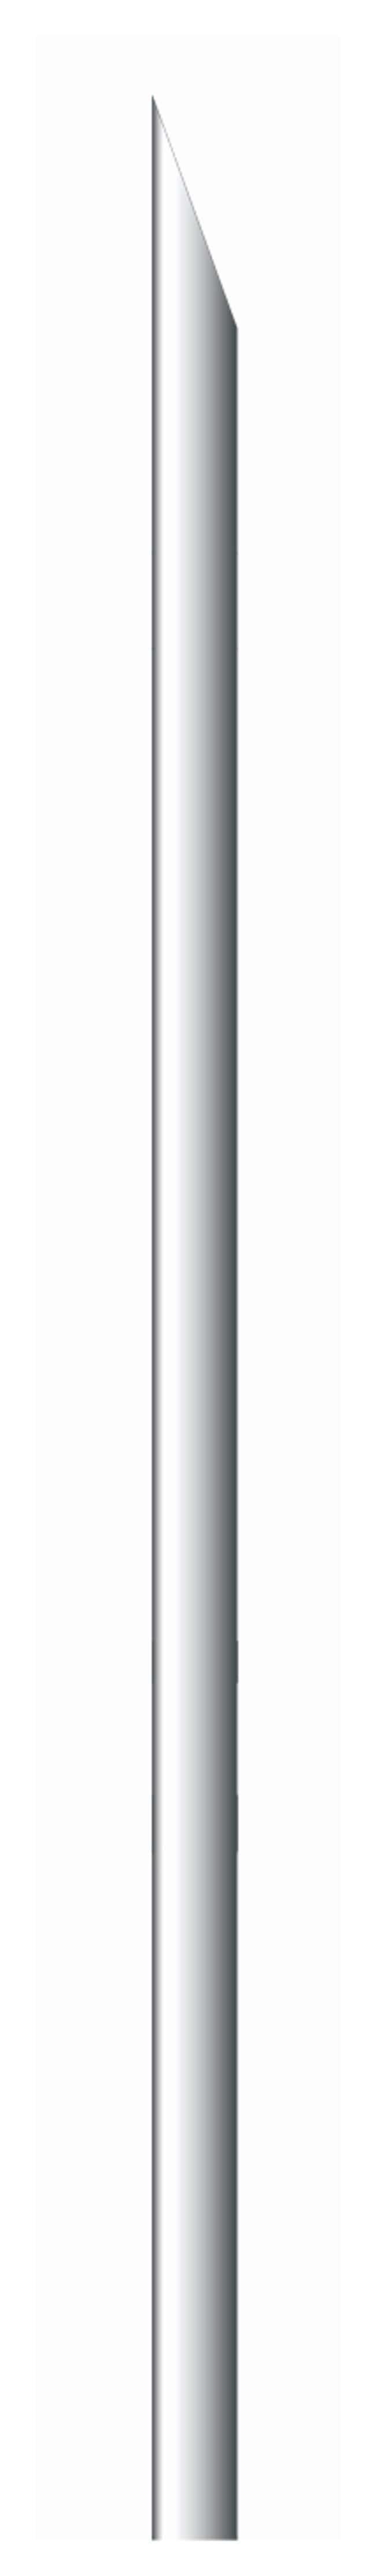 SGE™Gastight Syringes: Removable-Needle Models: Syringes and Needles Syringes and Syringes with Needles